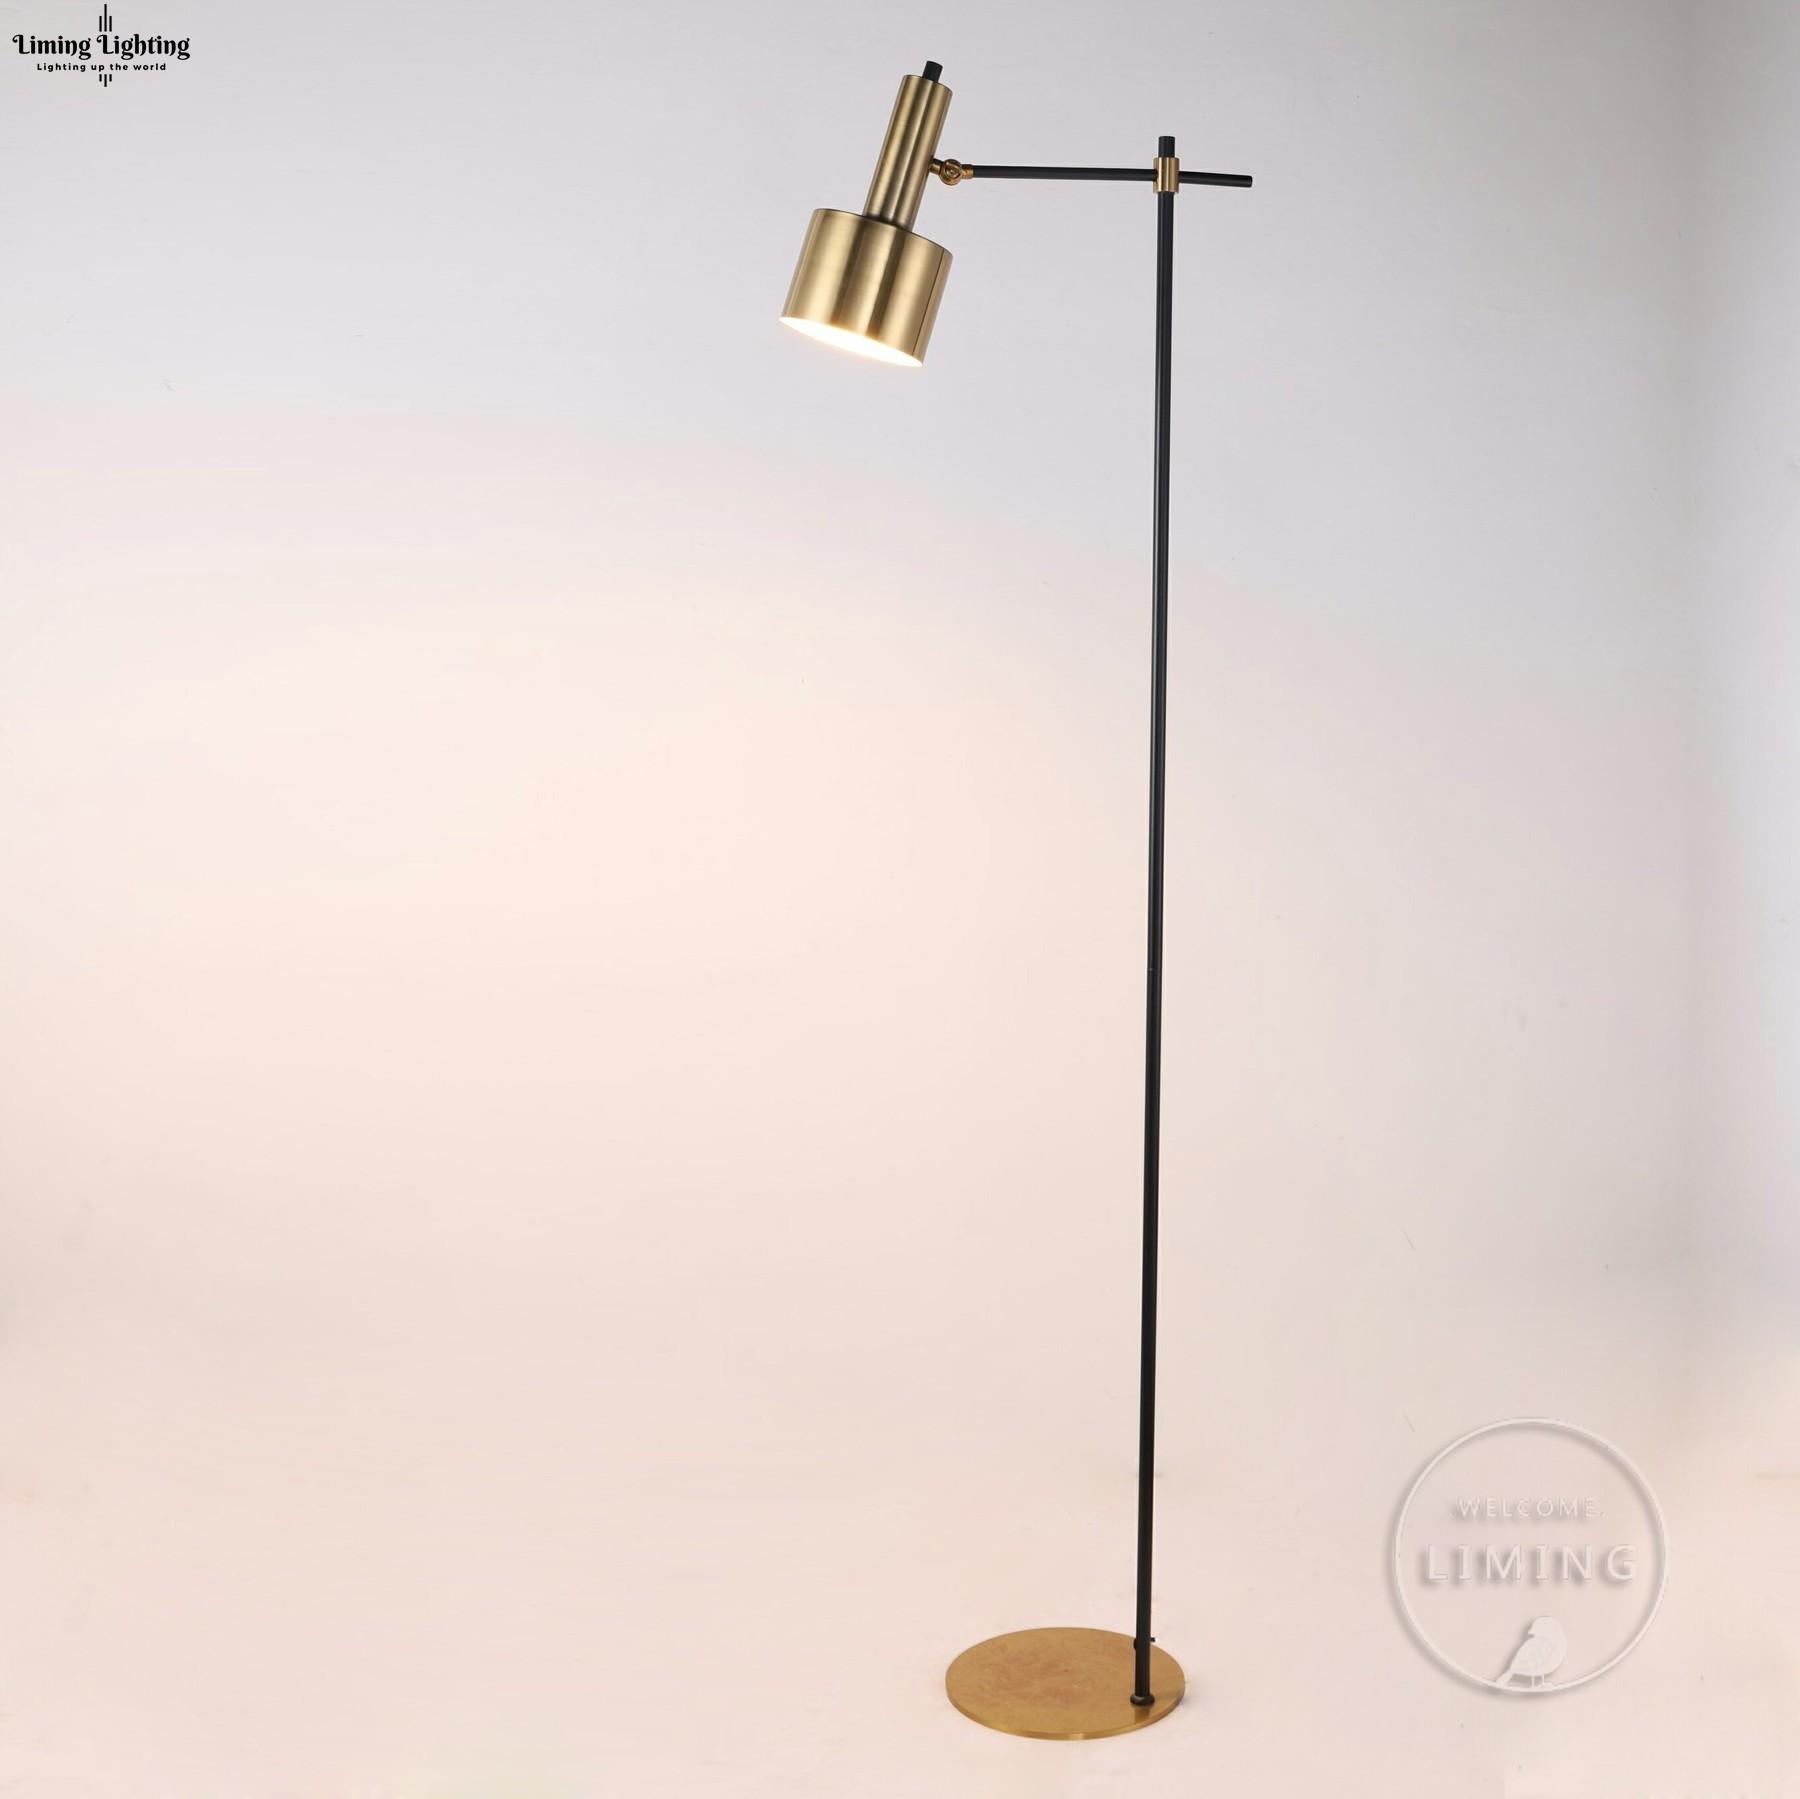 Full Size of Wohnzimmer Stehlampe Holz Stehleuchte Dimmbar Led Stehlampen Kreative Einfache Retro Kupfer Chrom Gold Schlafzimmer Kunst Beleuchtung Von Wohnzimmer Wohnzimmer Stehlampe